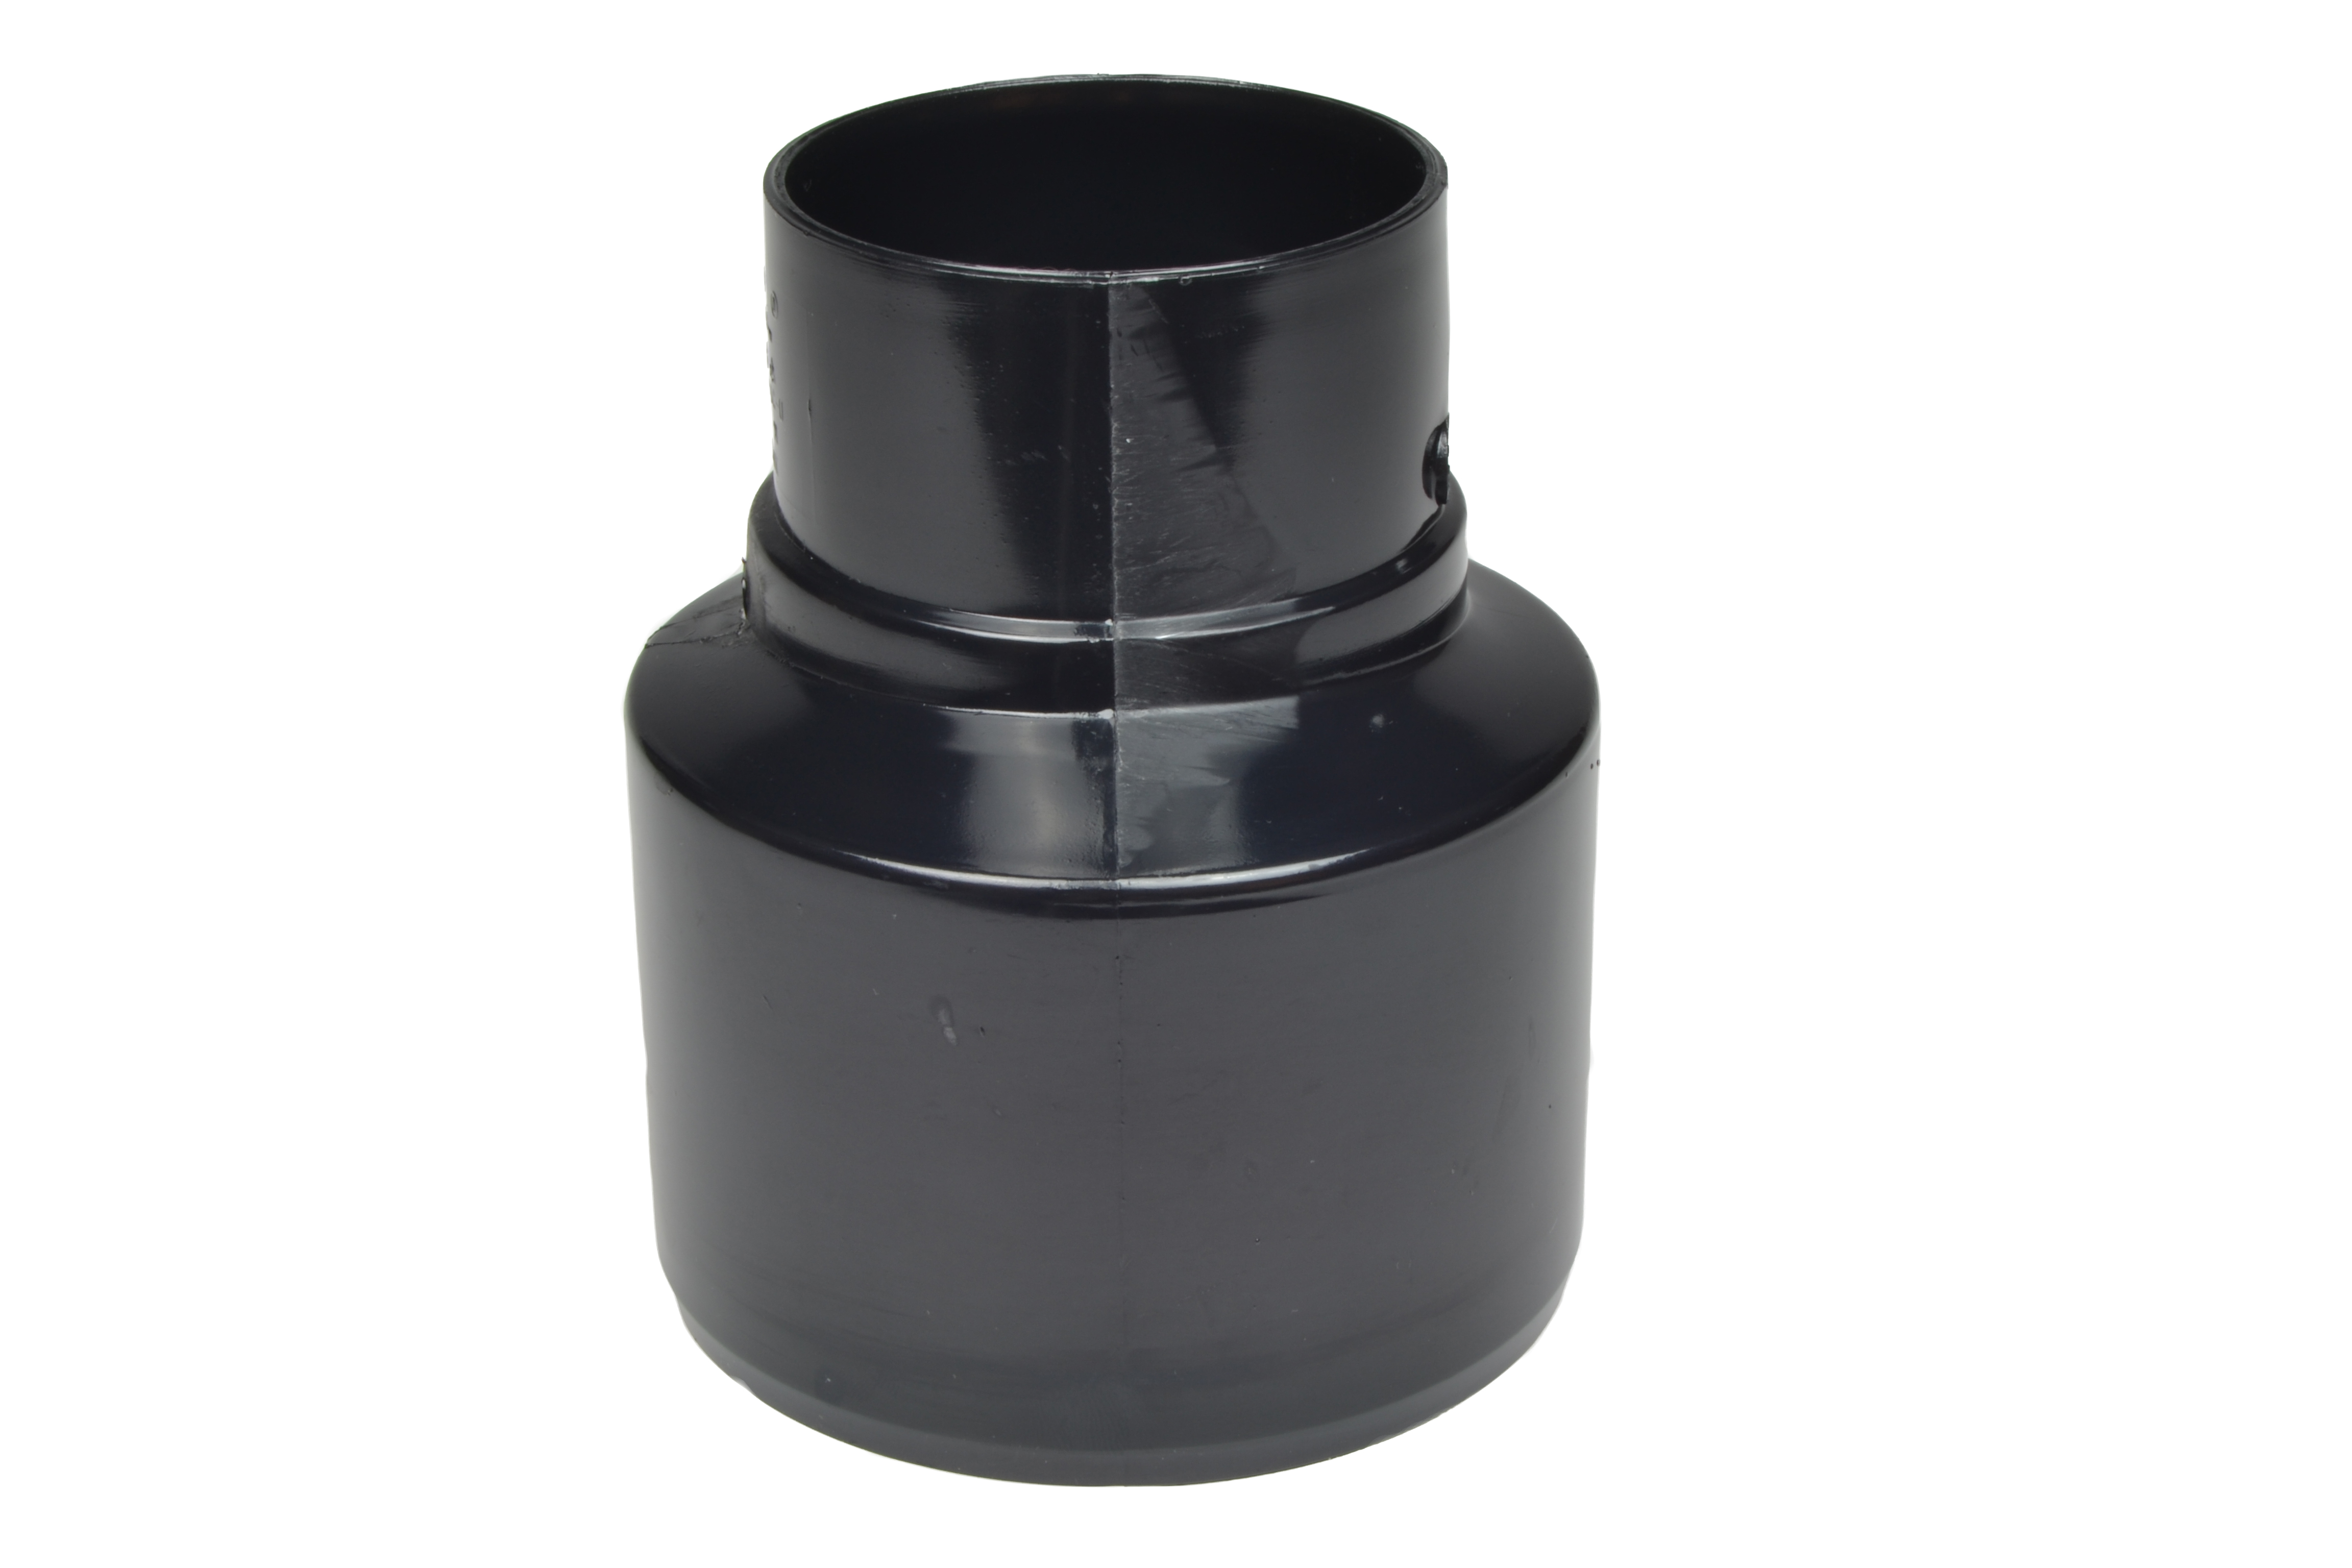 Soli to Rain Water Adaptor - Black